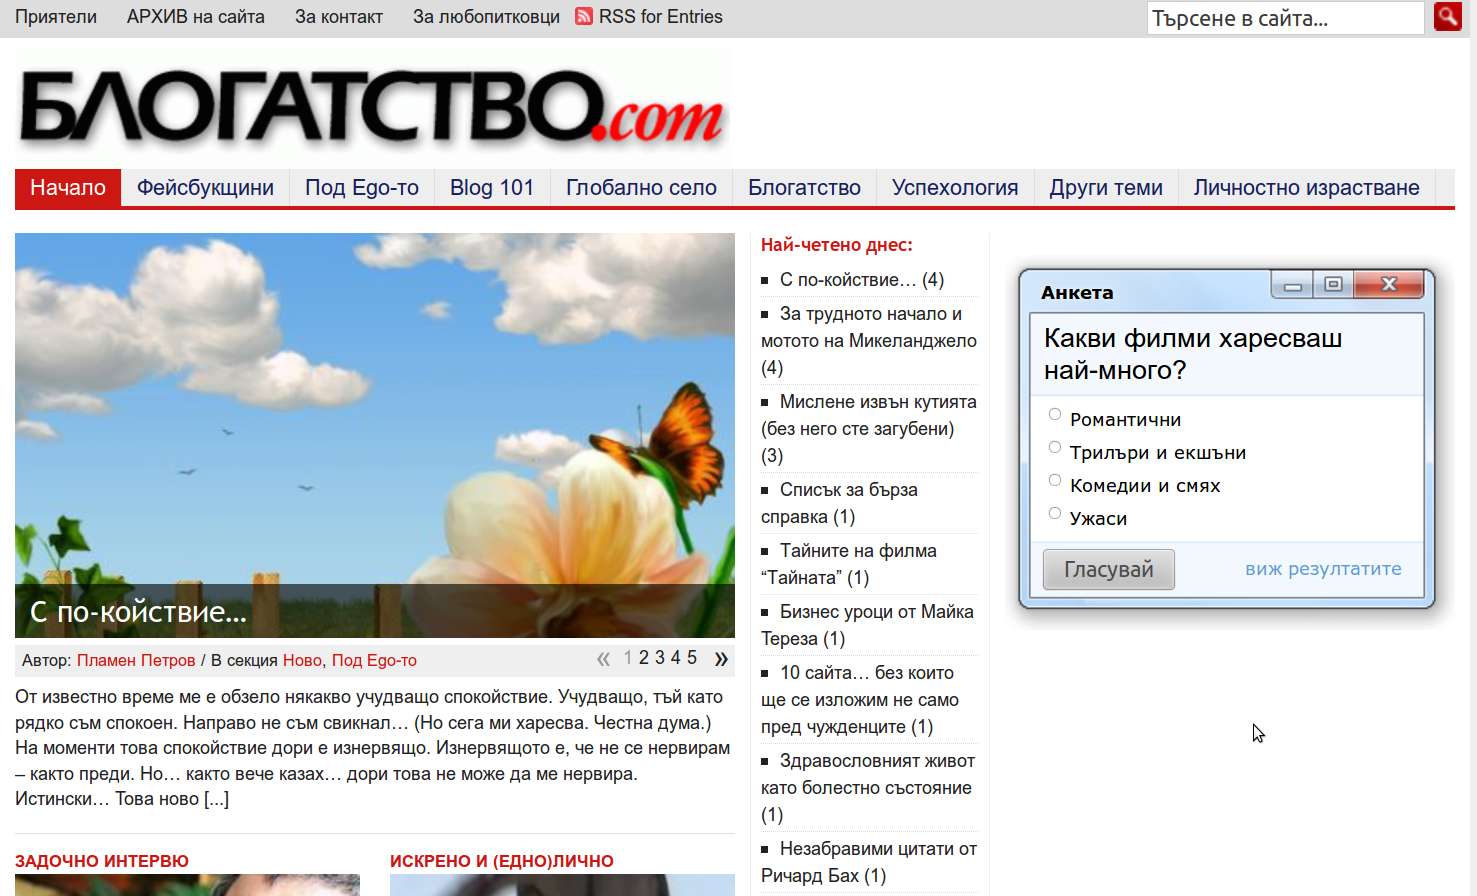 blogatstvo